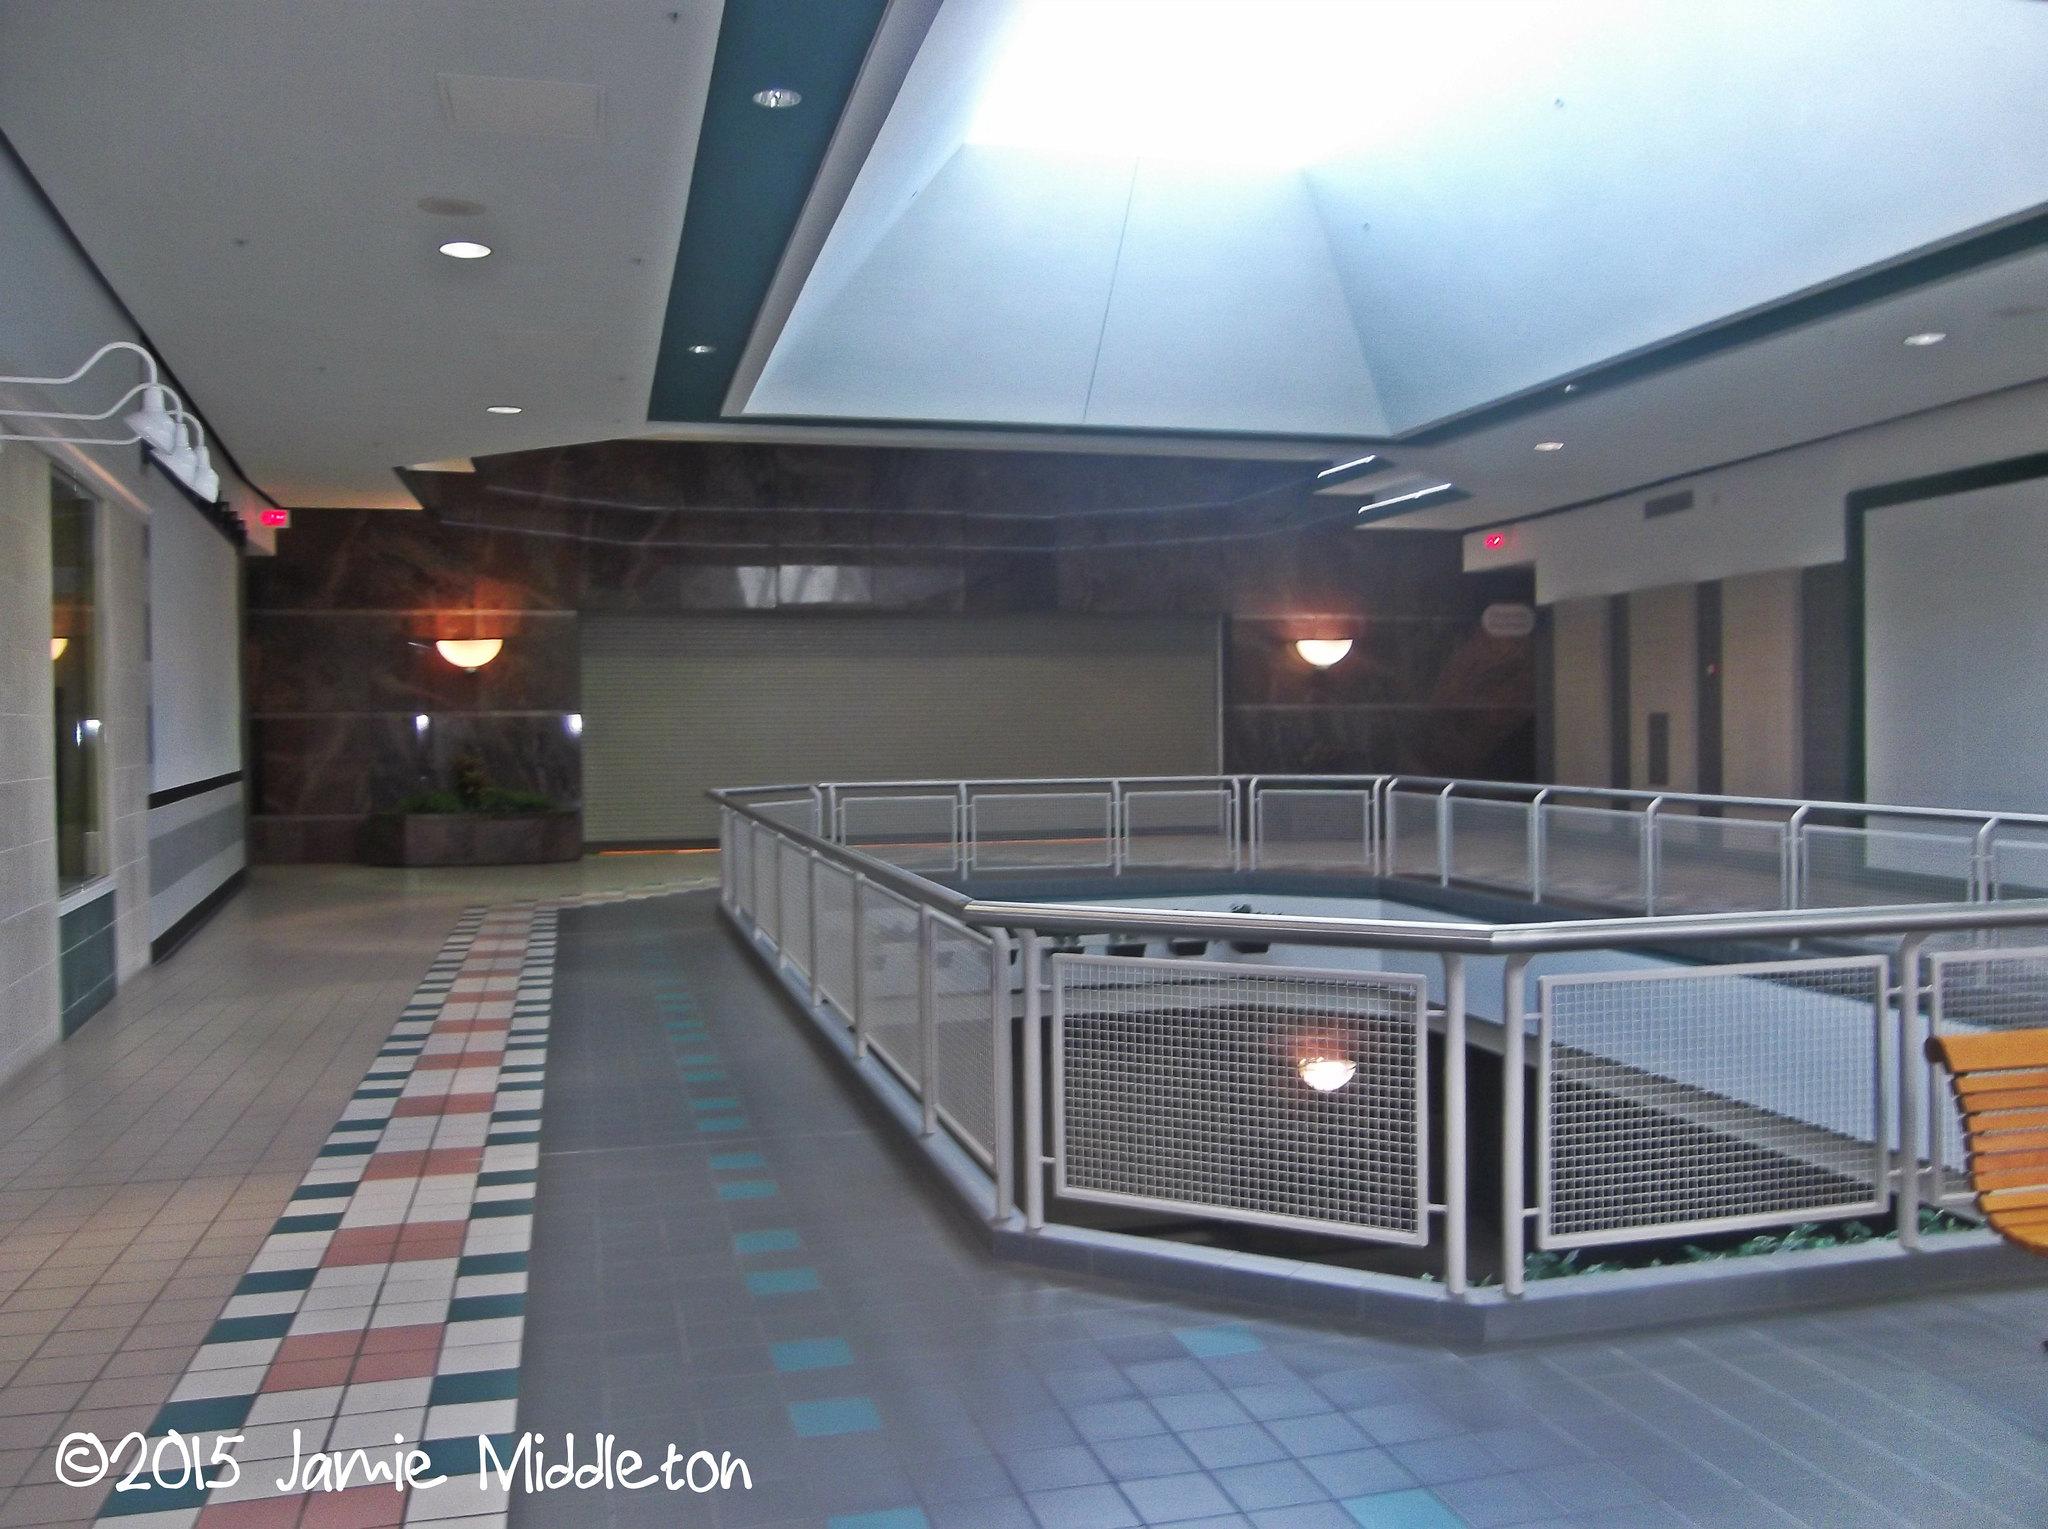 Oak Hollow Mall -- High Point, North Carolina